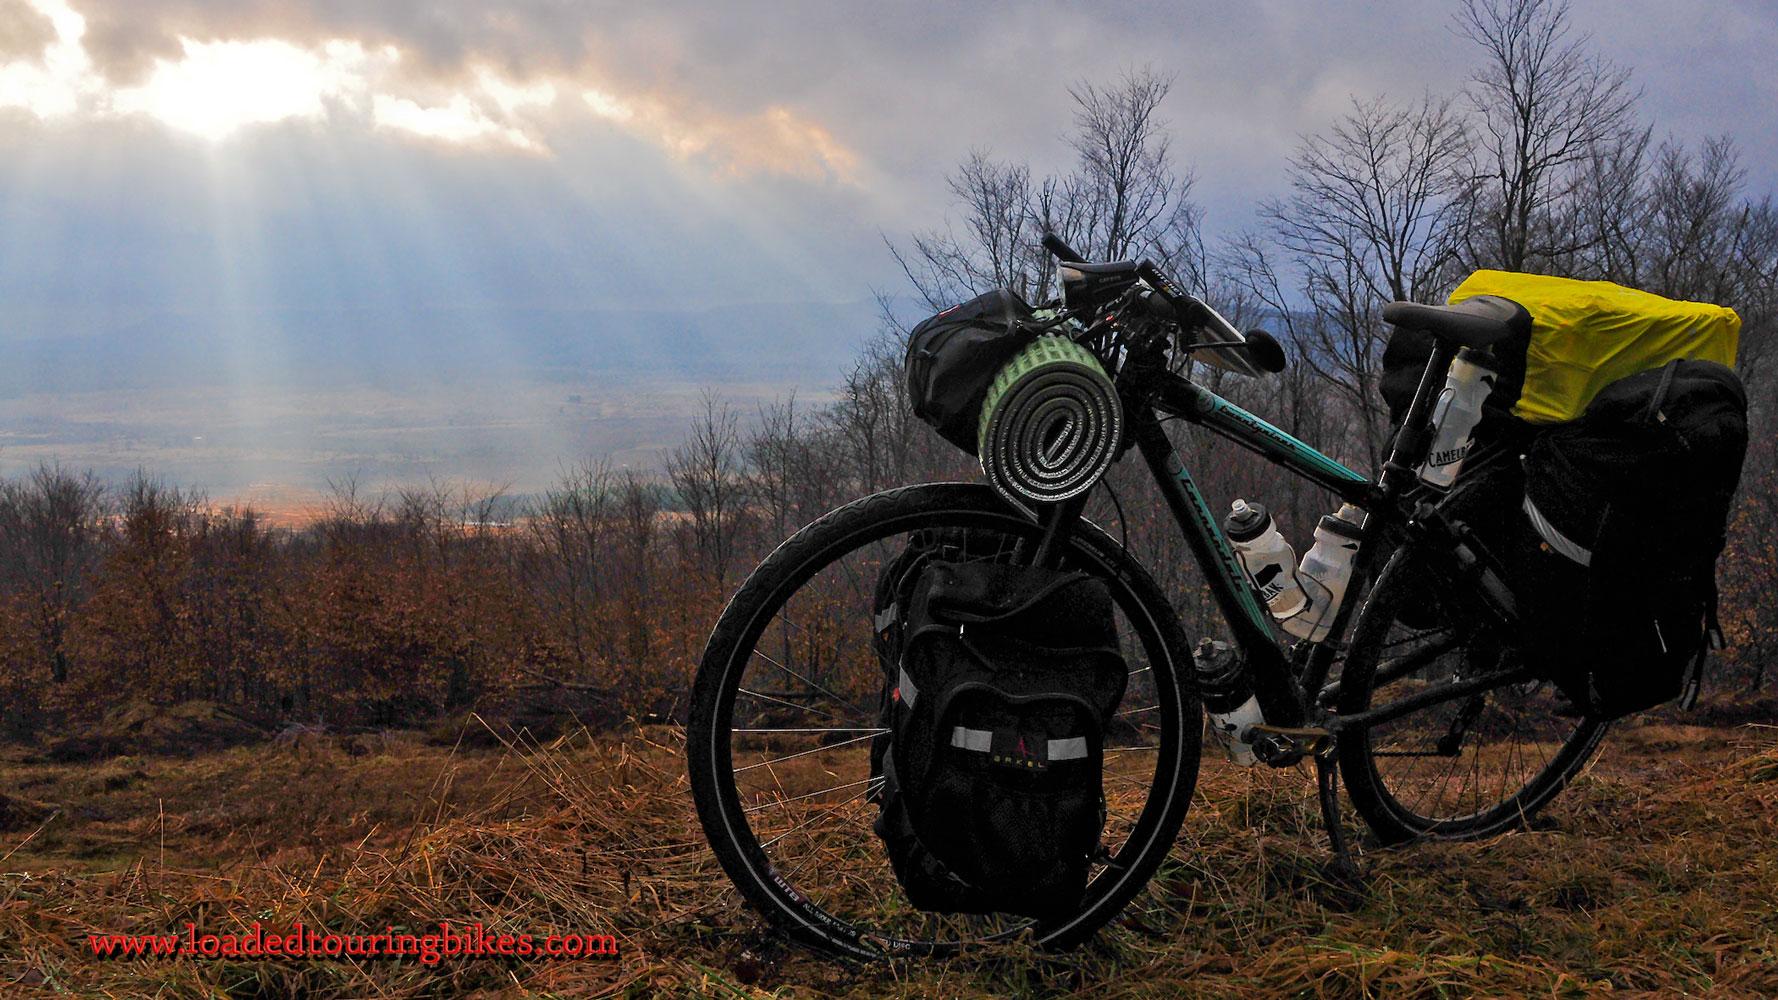 397    Ludovic touring West Virginia - Cannondale Twentyniner touring bike